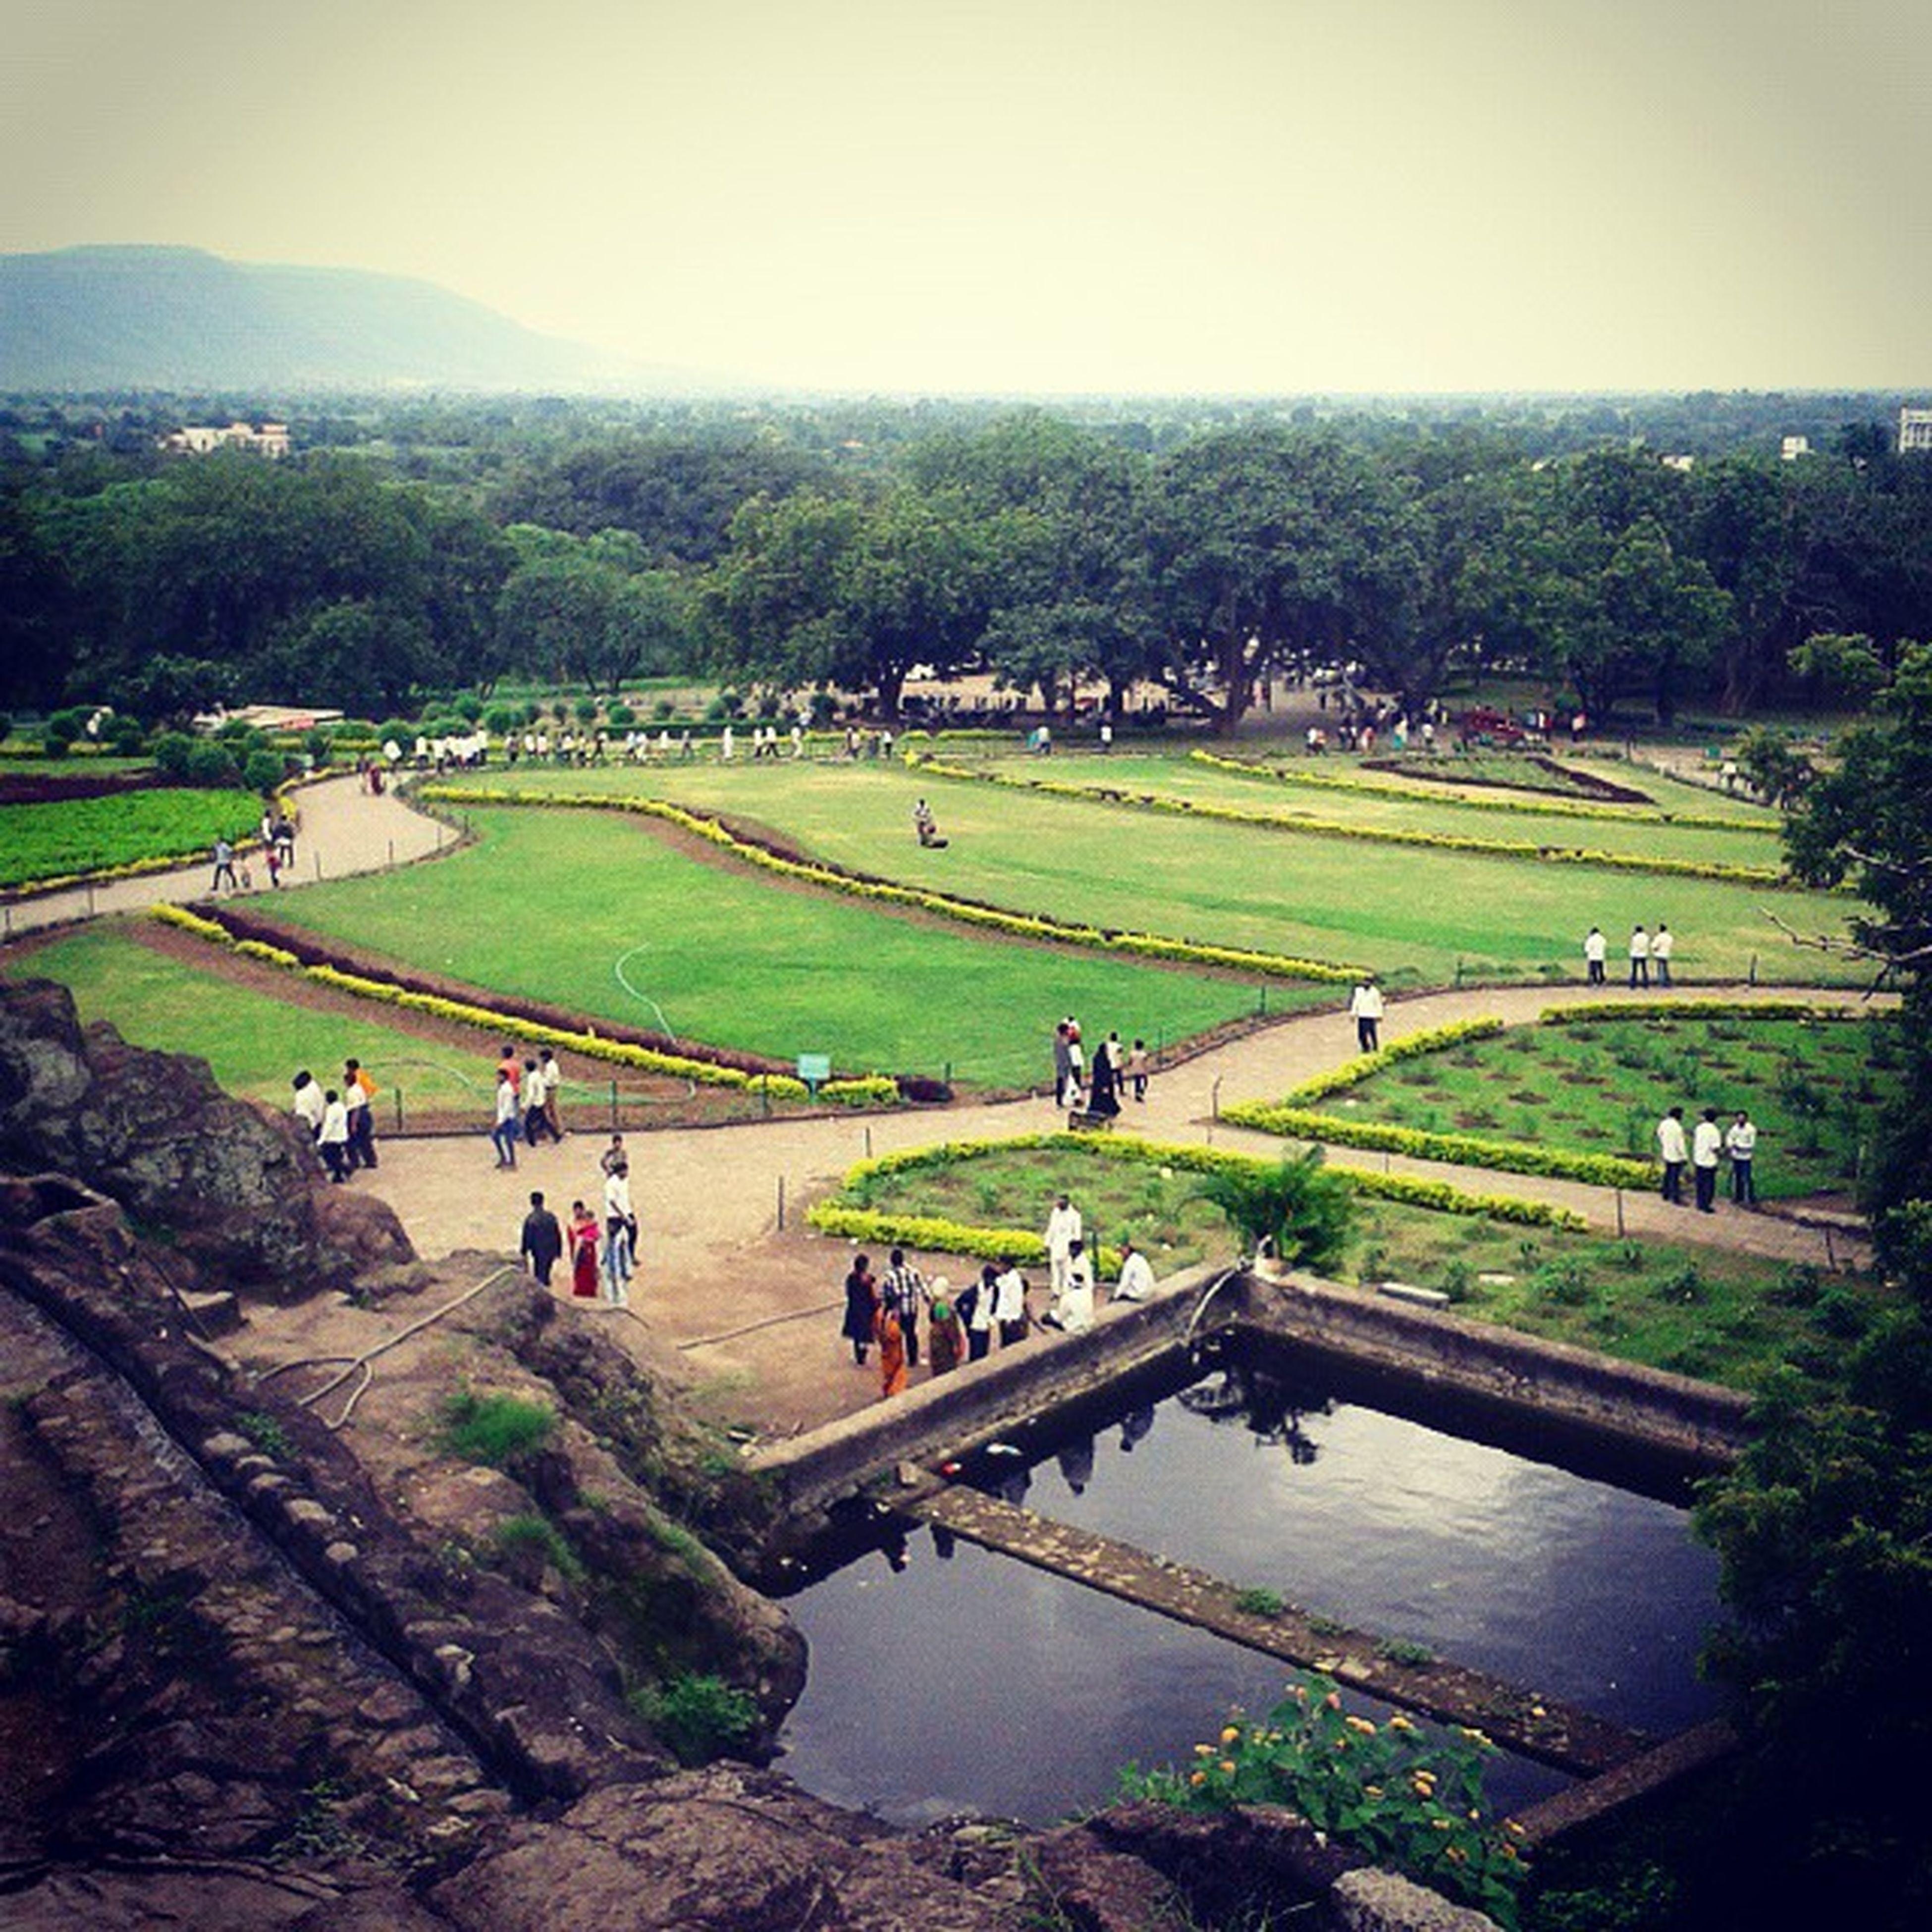 College trip @ Ajanta Caves, amazing experience, self clicked Collegetrip Ajantacaves Highpoint Kadakview Myclicks Memories Beautifulscenes Selfphotography Mobilephotography